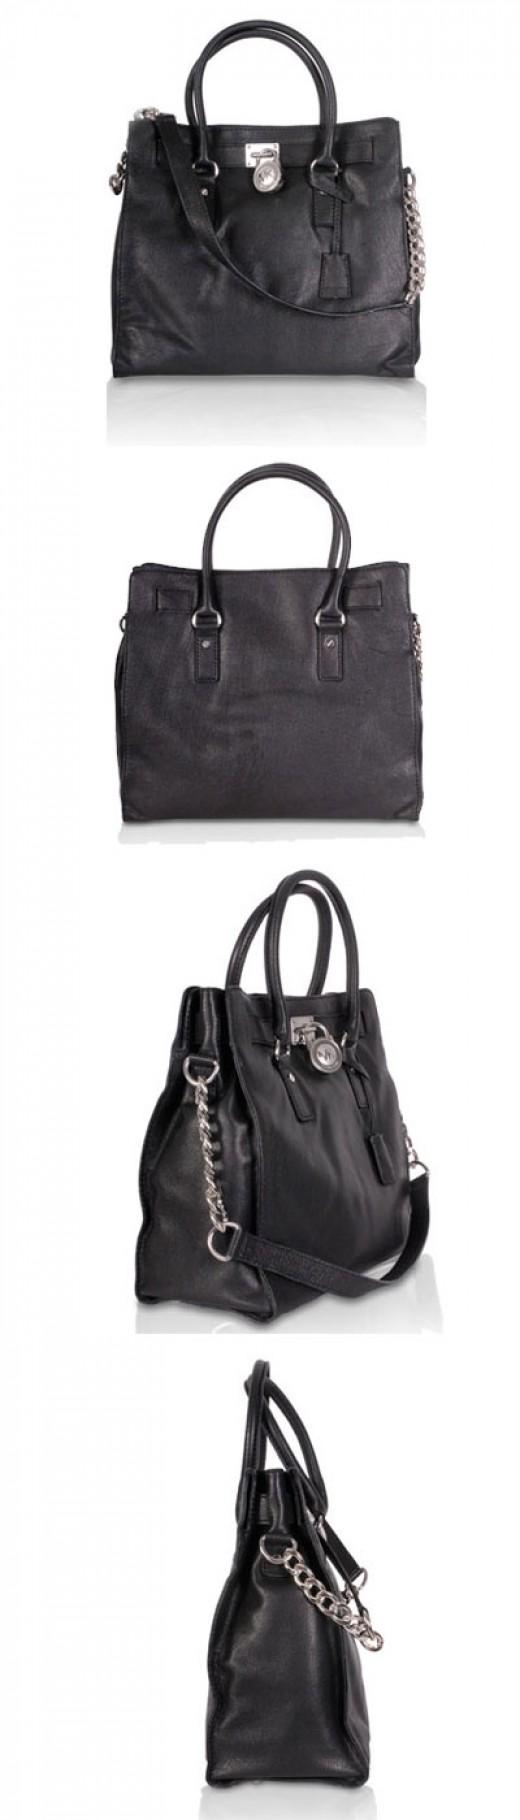 Michael Kors large Hamilton Luxury bag